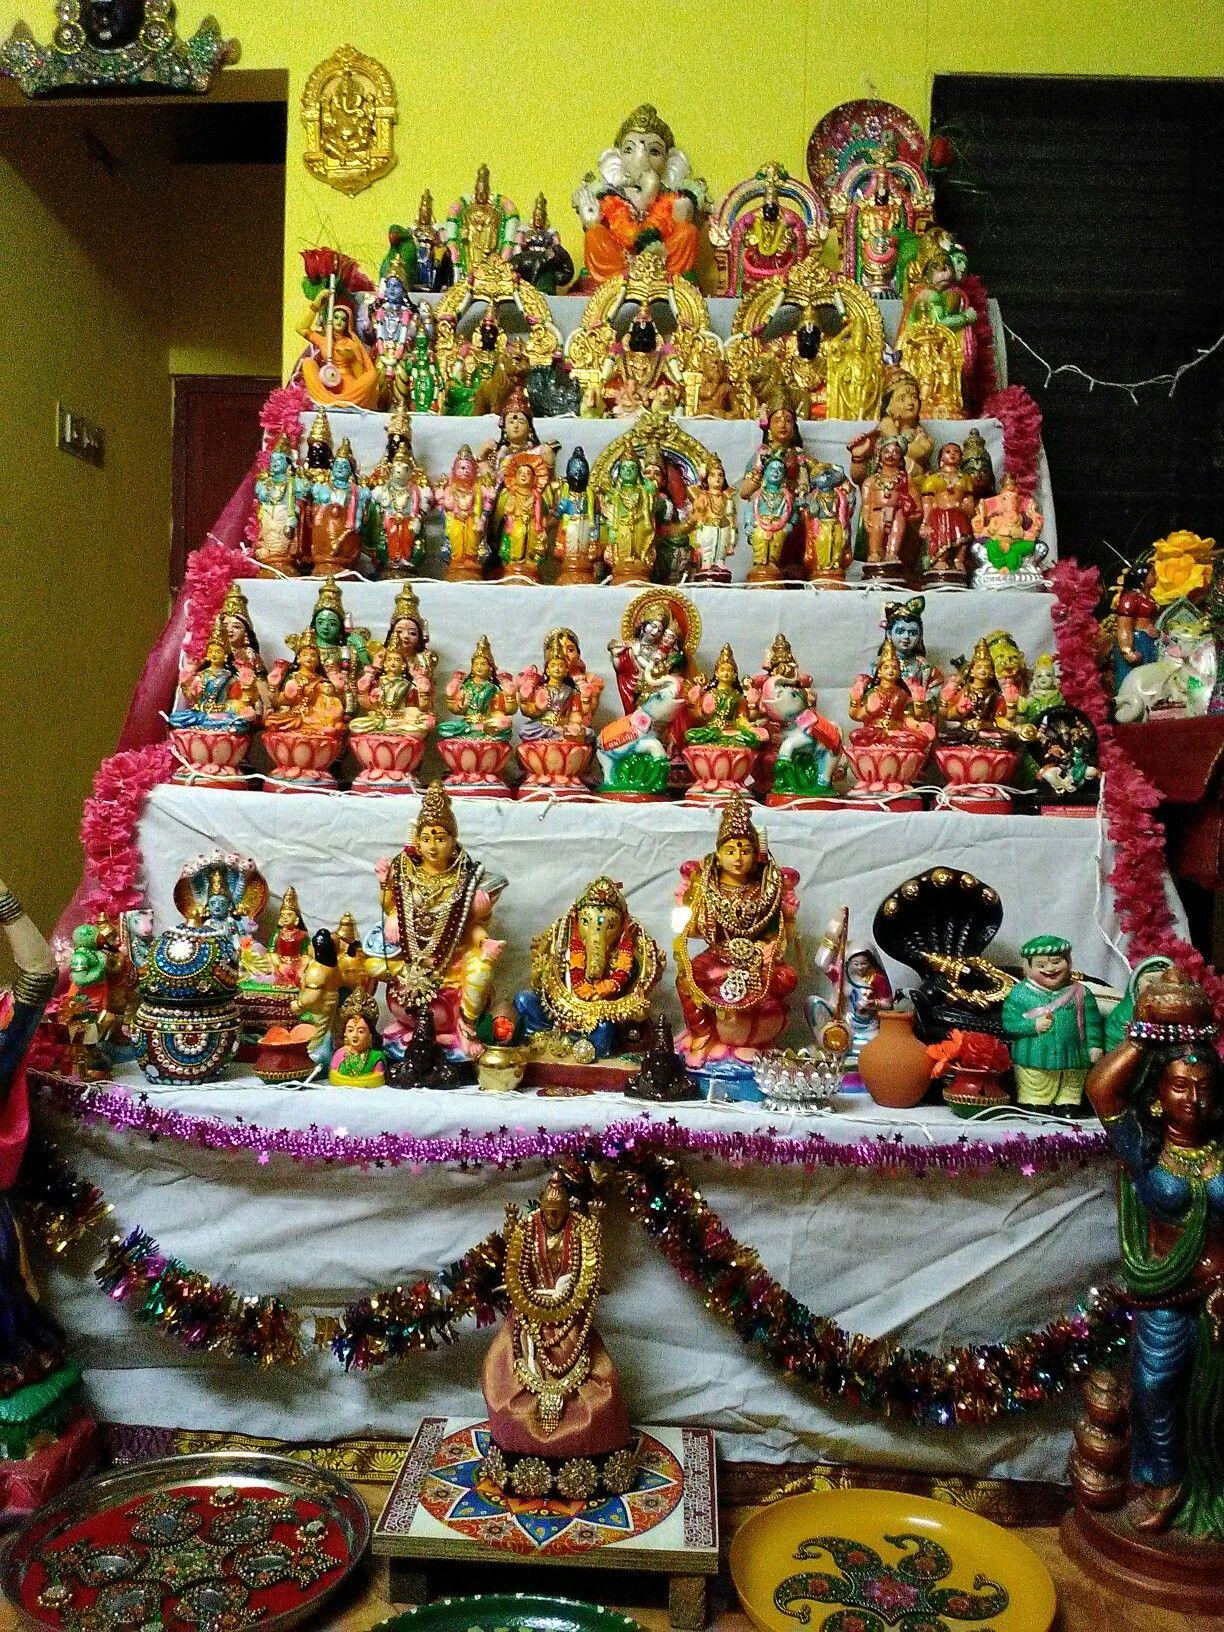 Kondapalli toys images  South Indian navaratri golu  navaratri golu  Pinterest  Indian